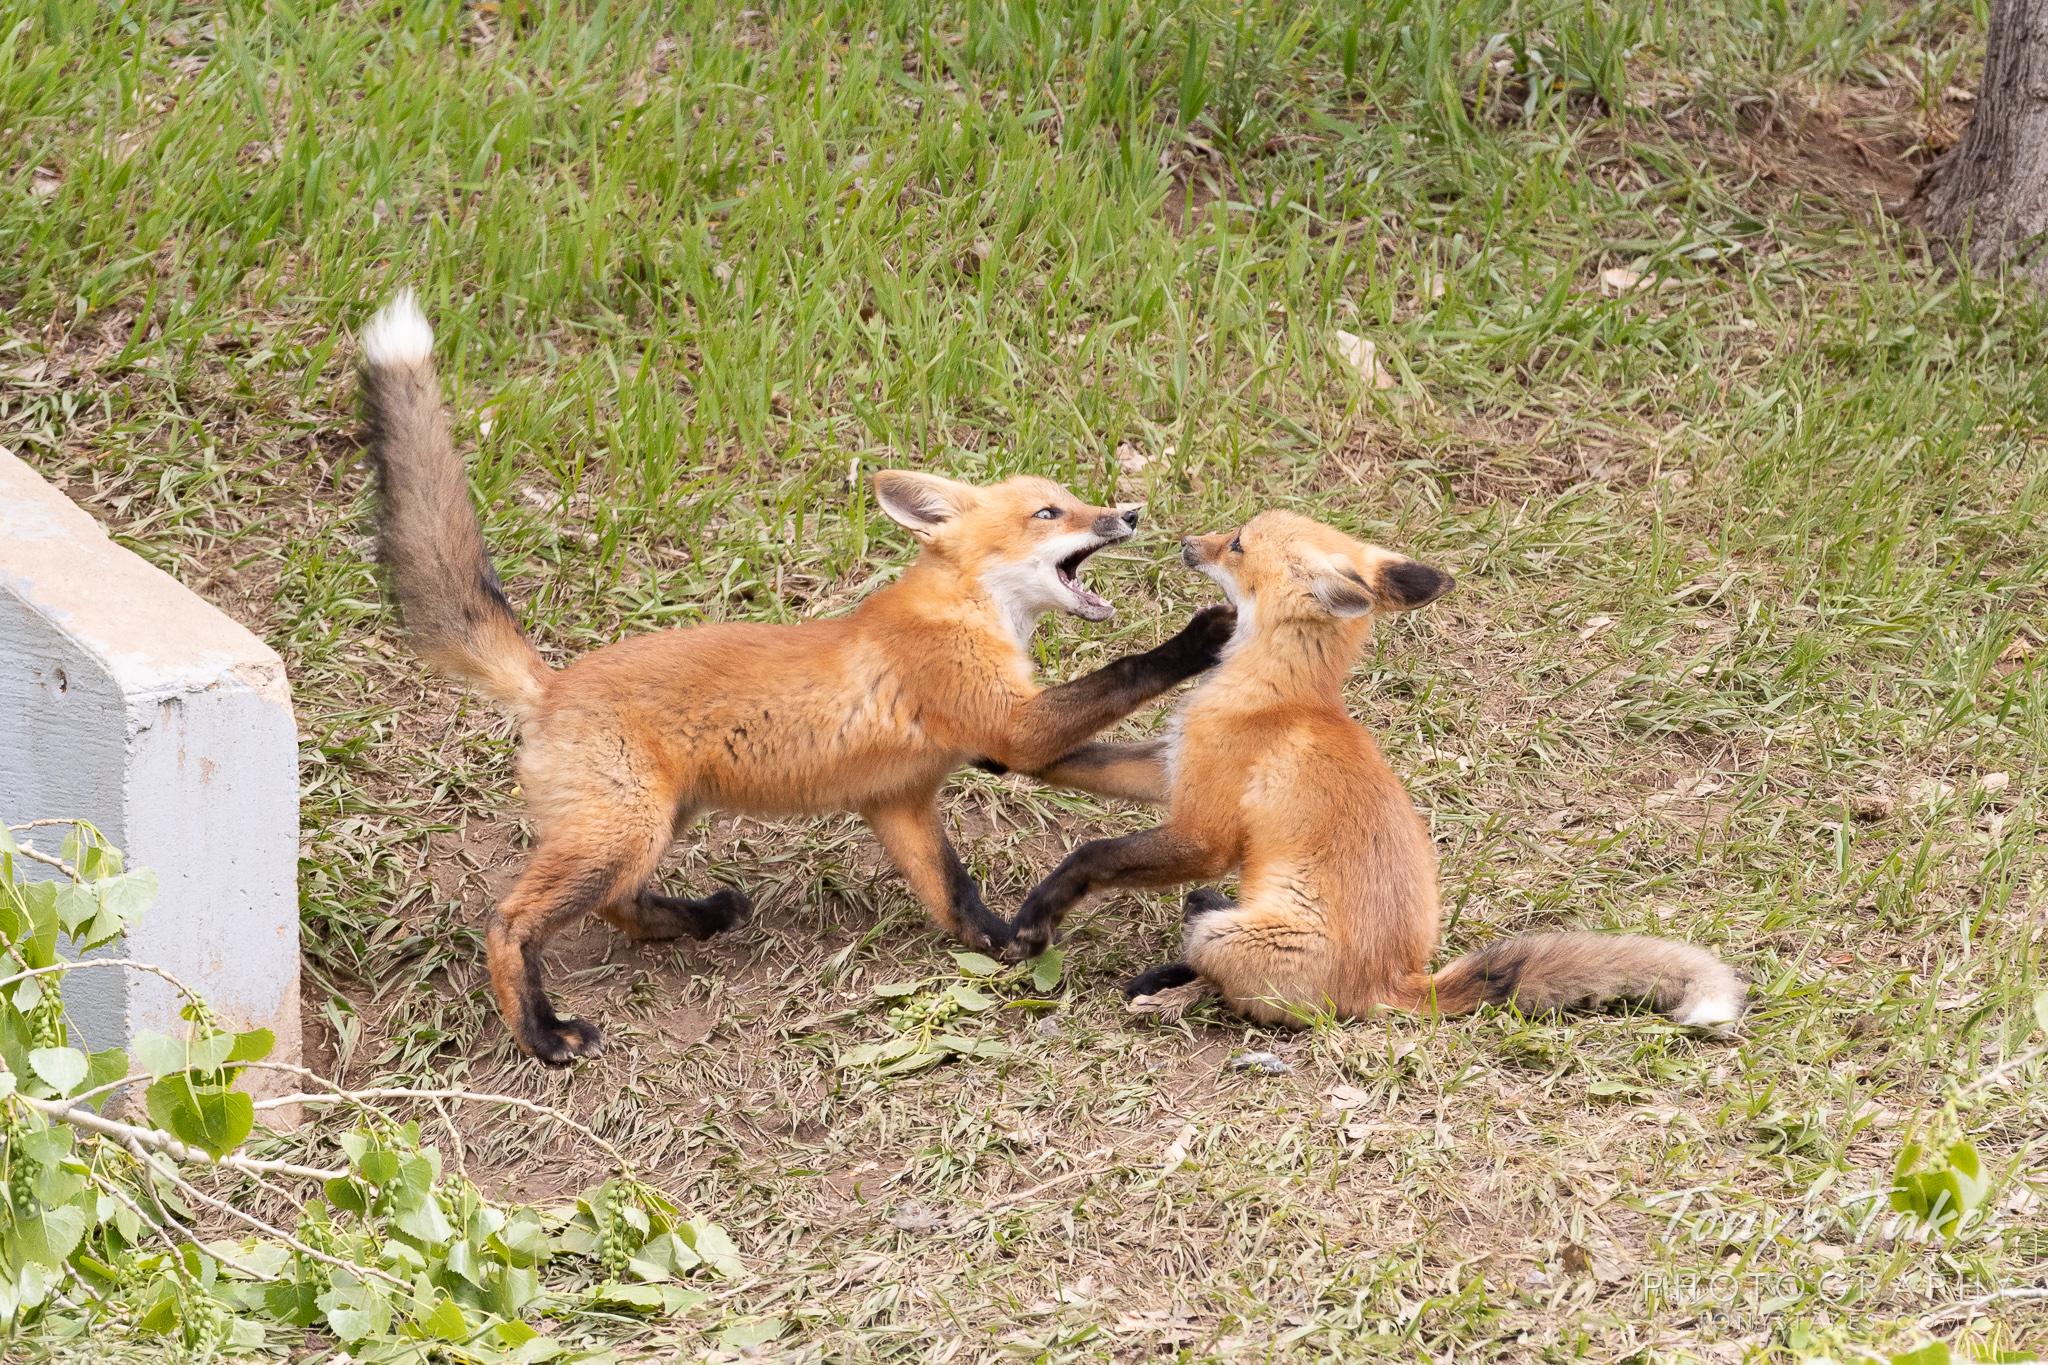 A pair of fox kits plays in Colorado. (© Tony's Takes)